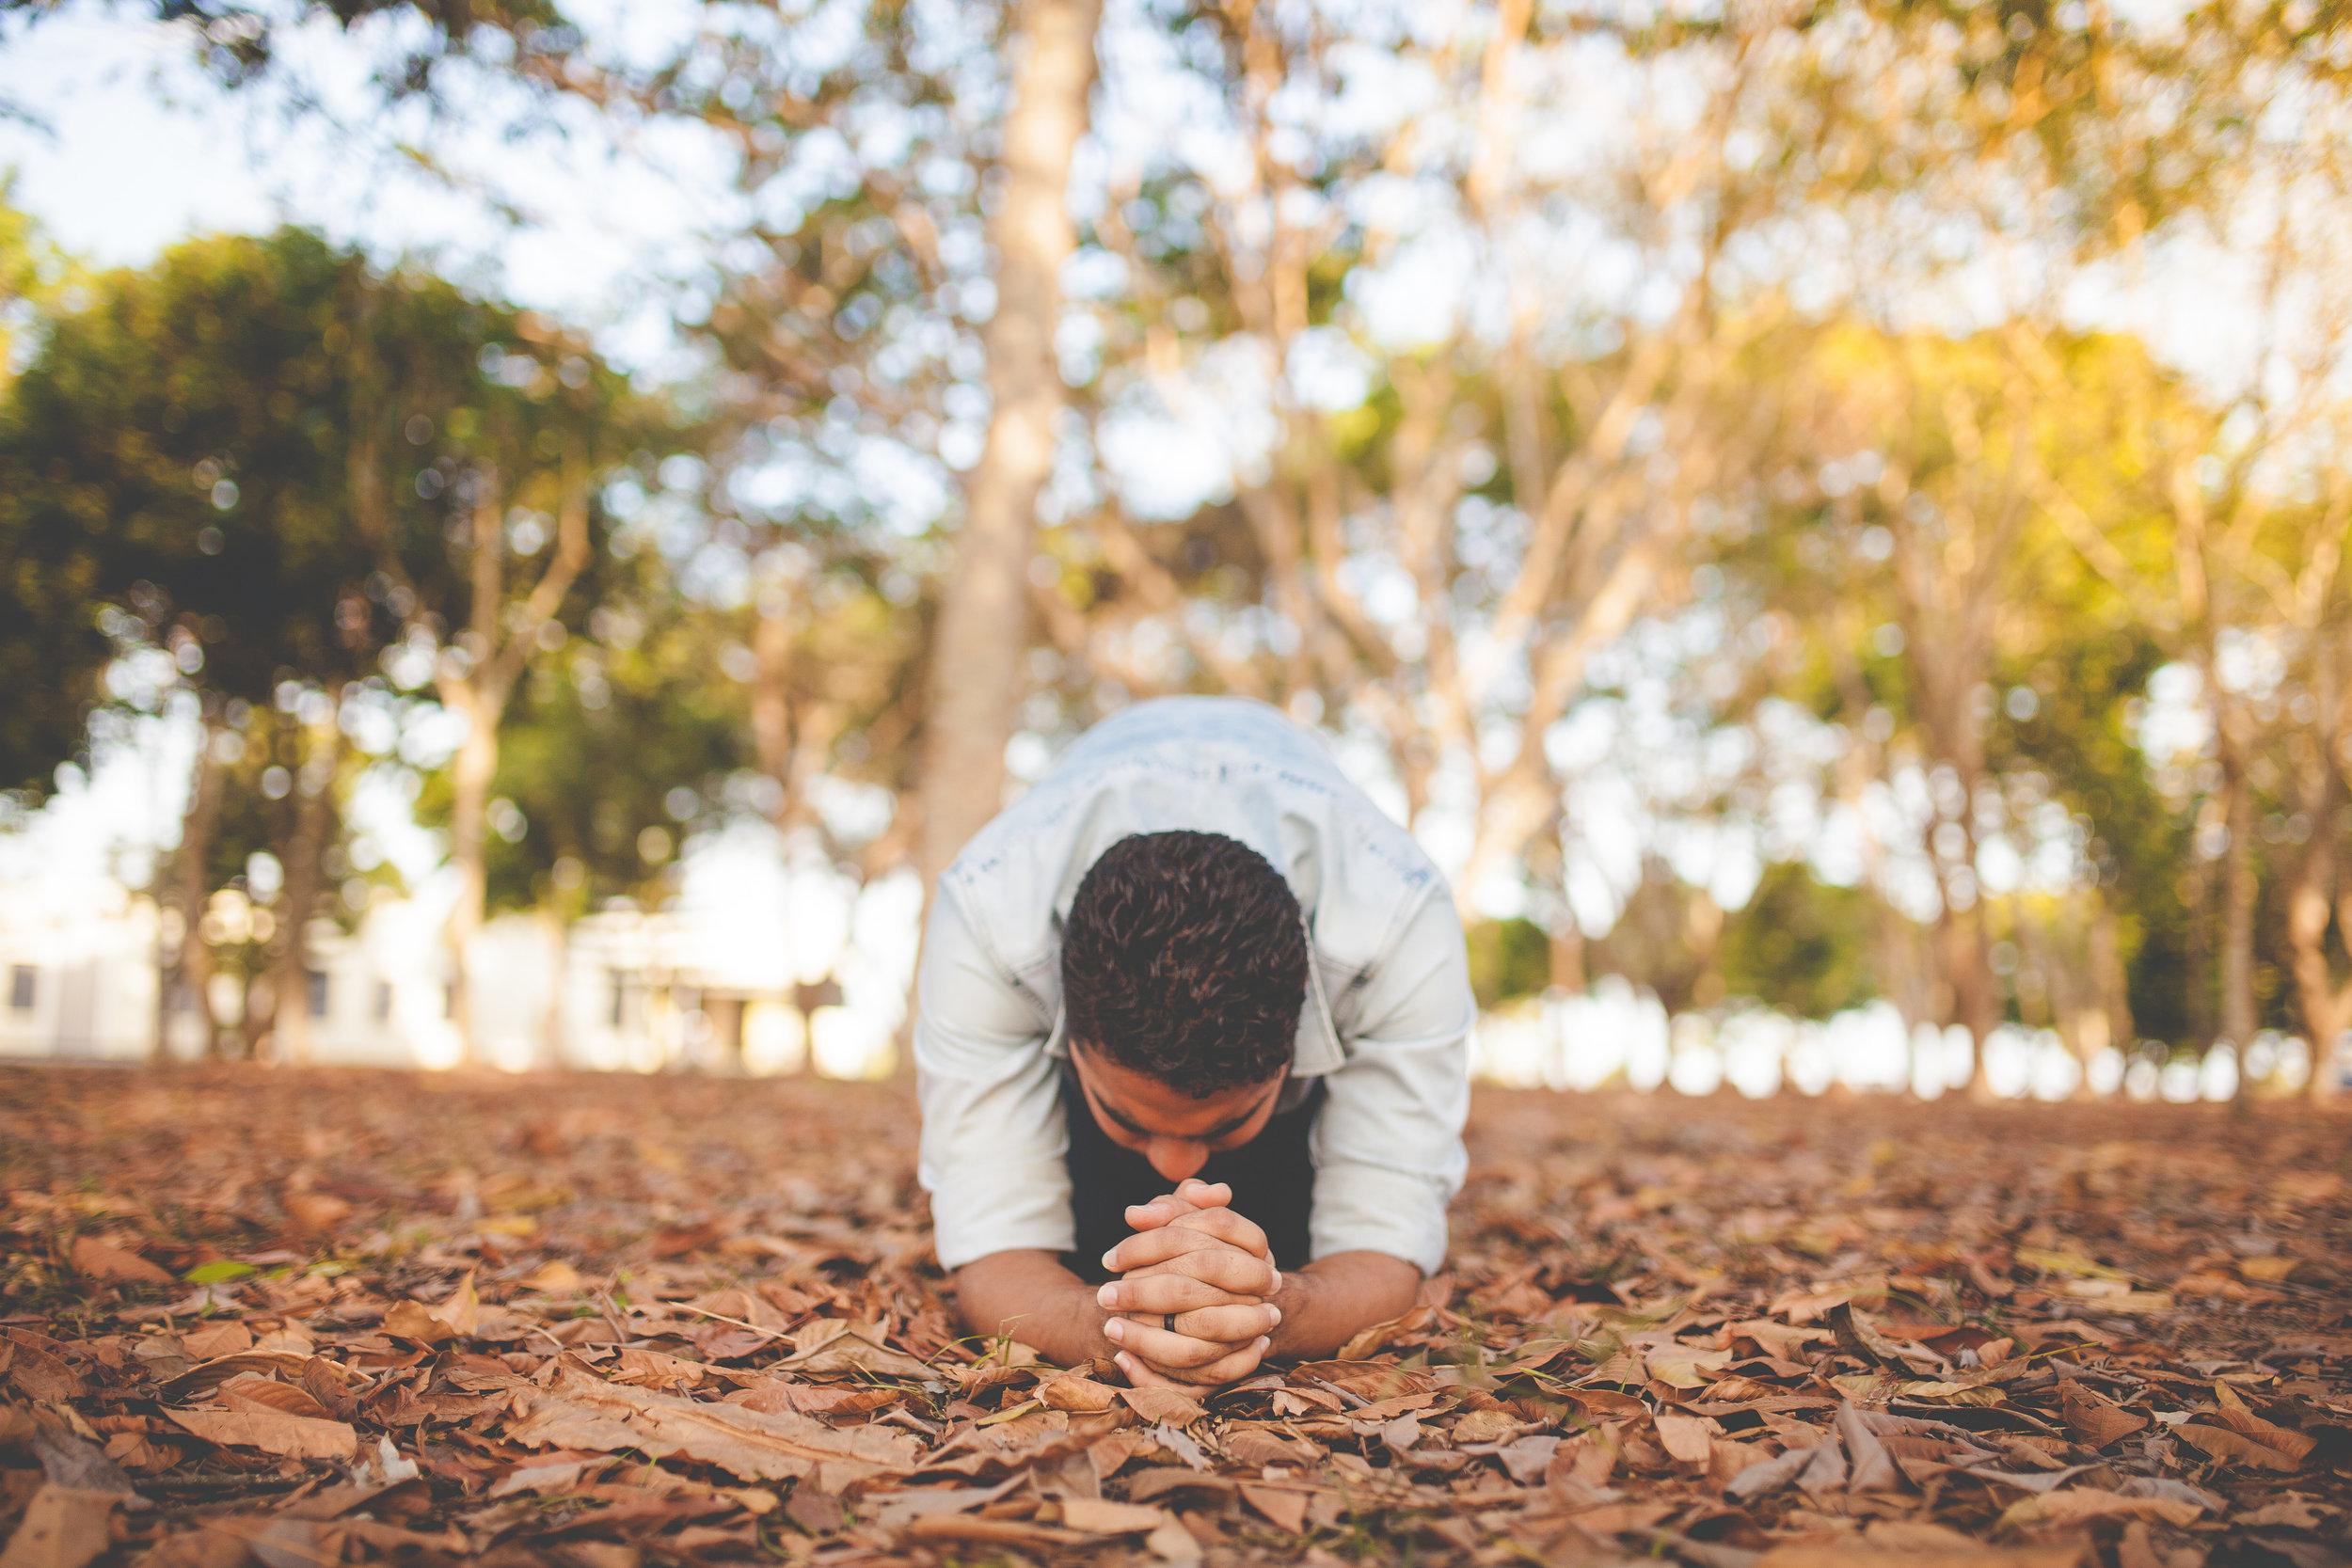 On My Knees, Dear Lord - © 2016Genre: Soft RockTheme: Religious & Spiritual